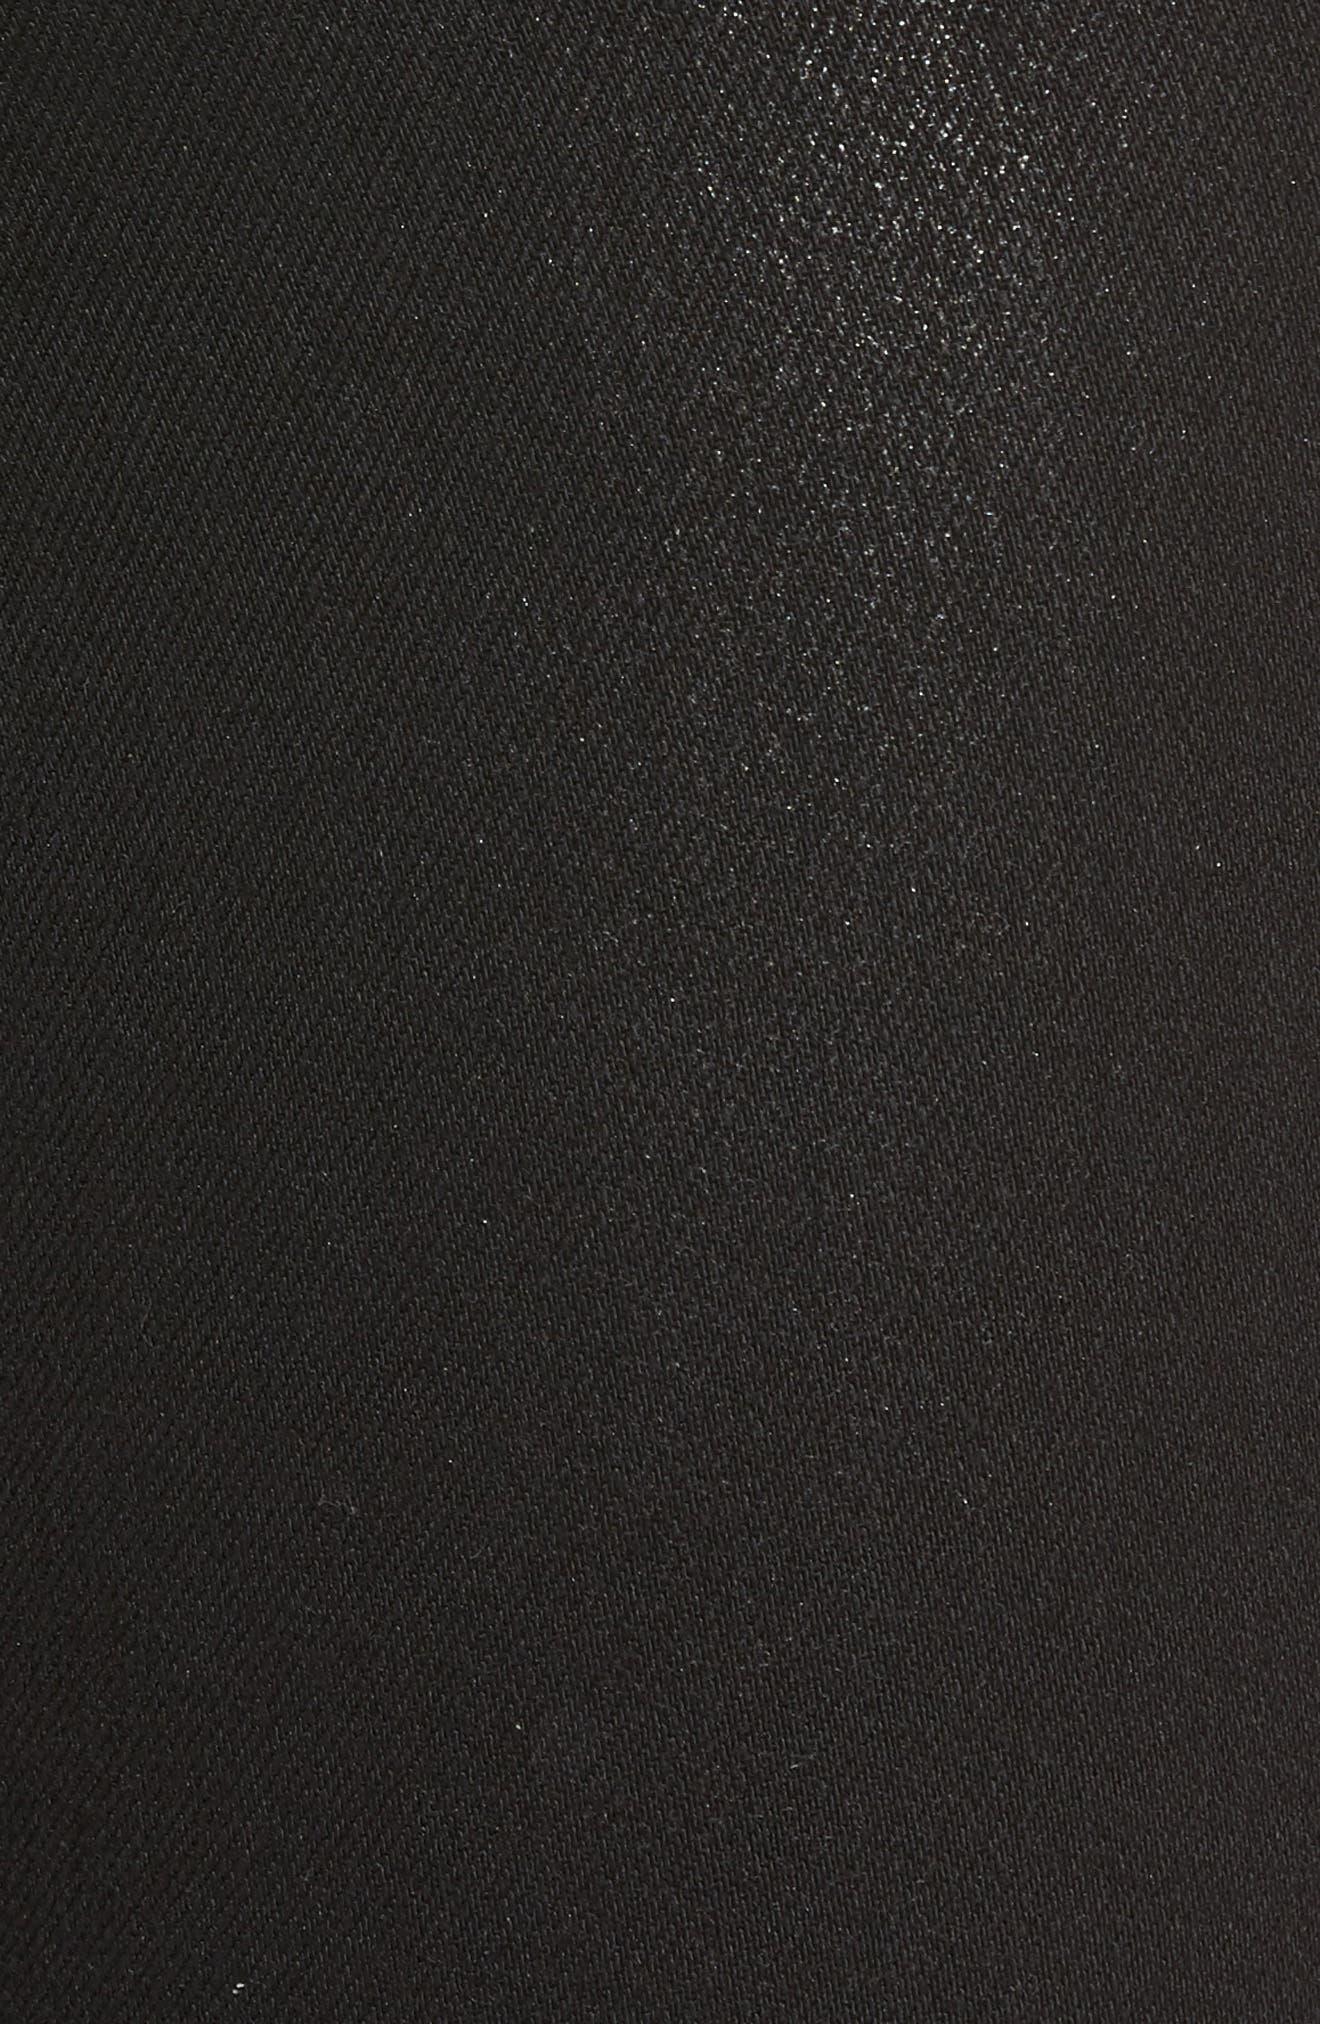 Alternate Image 5  - Hudson Jeans Kooper Coated Skinny Jeans (Black Coated)